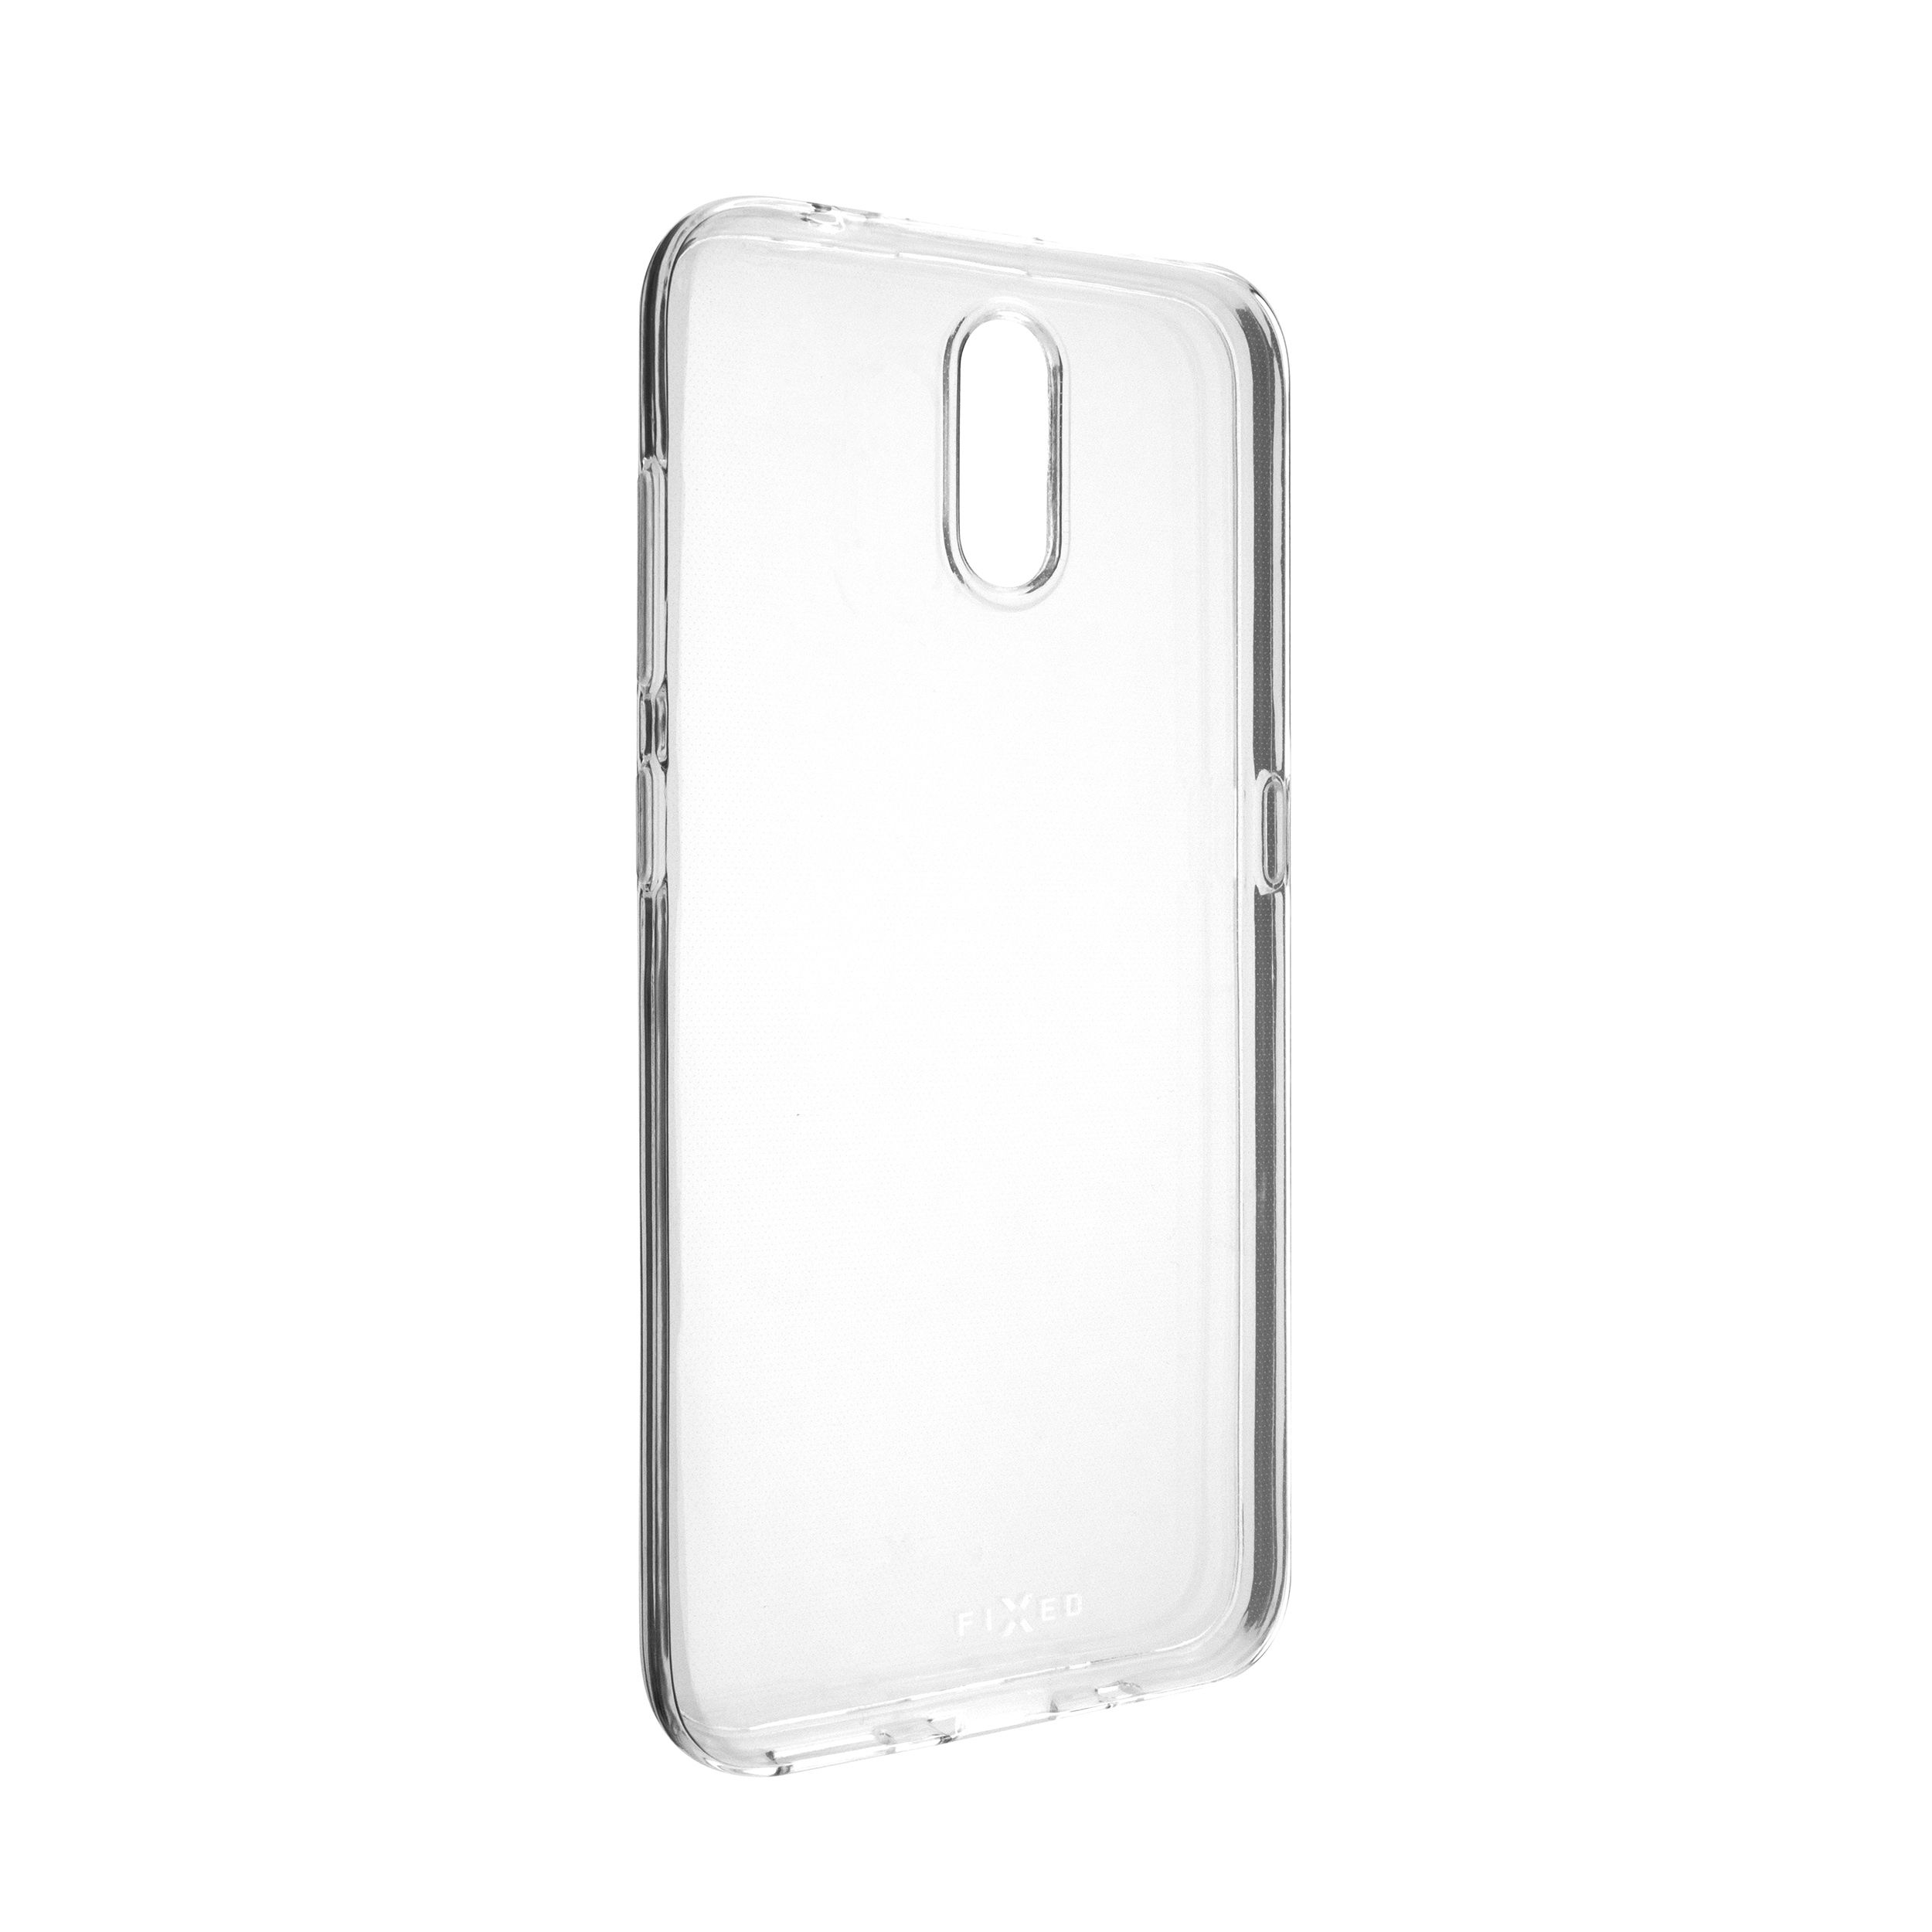 TPU gelové pouzdro FIXED pro Nokia 2.3, čiré